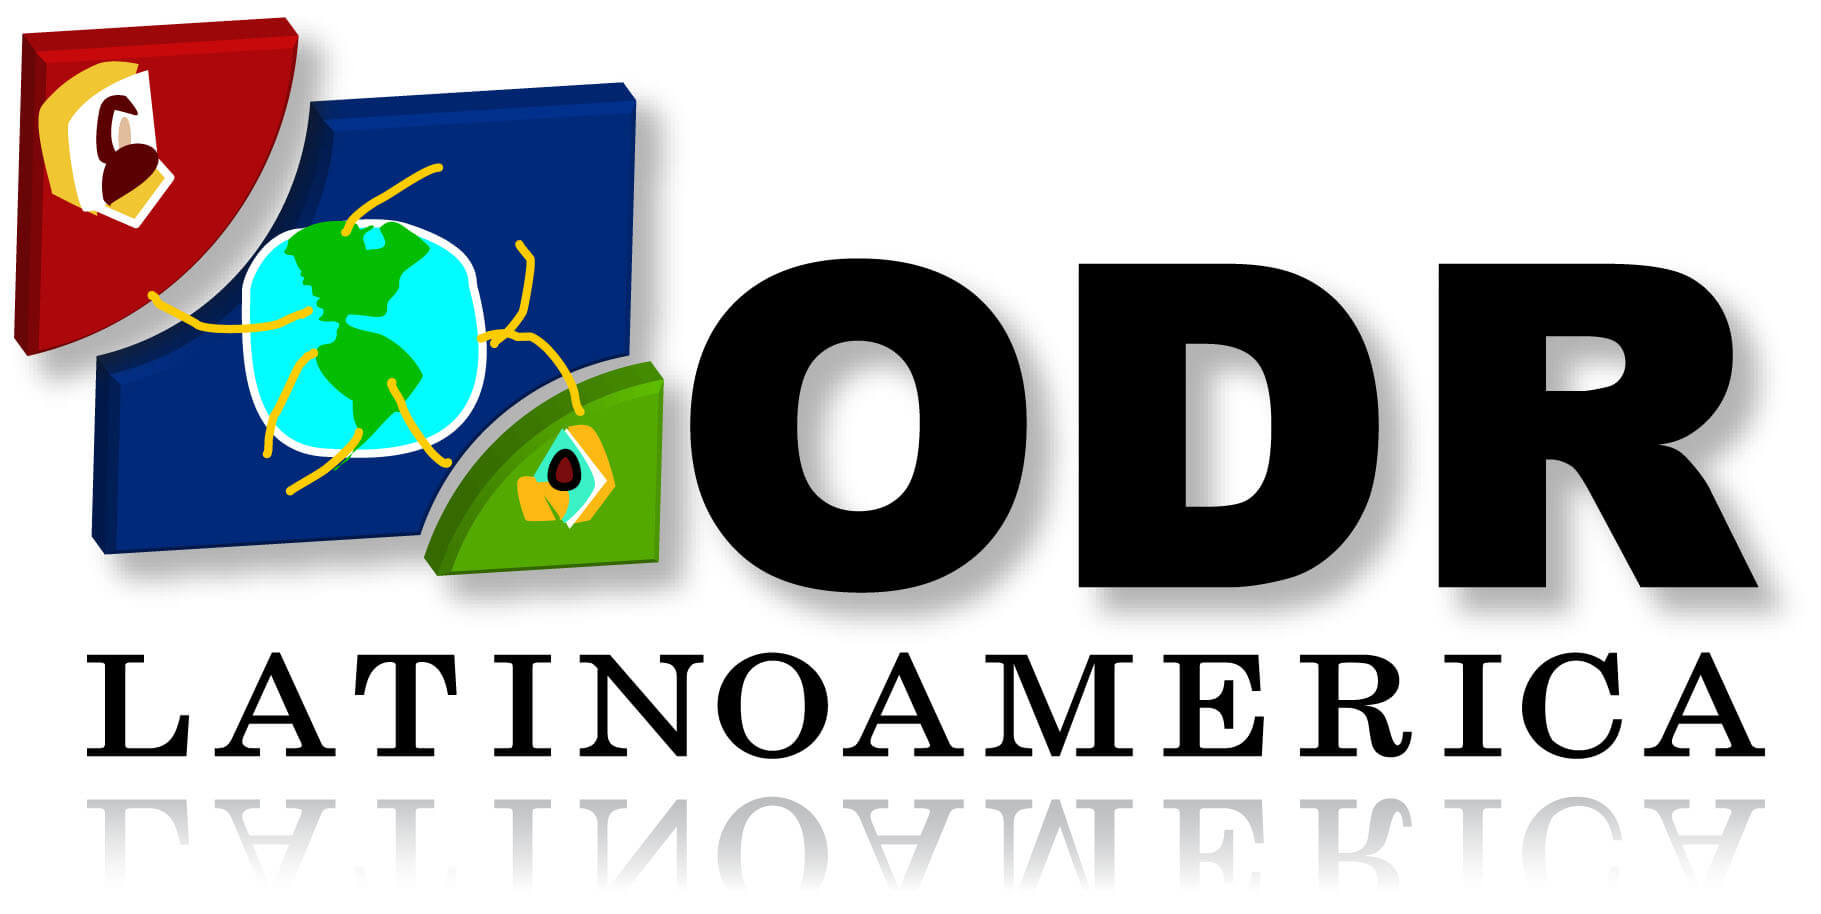 Latino America ODR logo